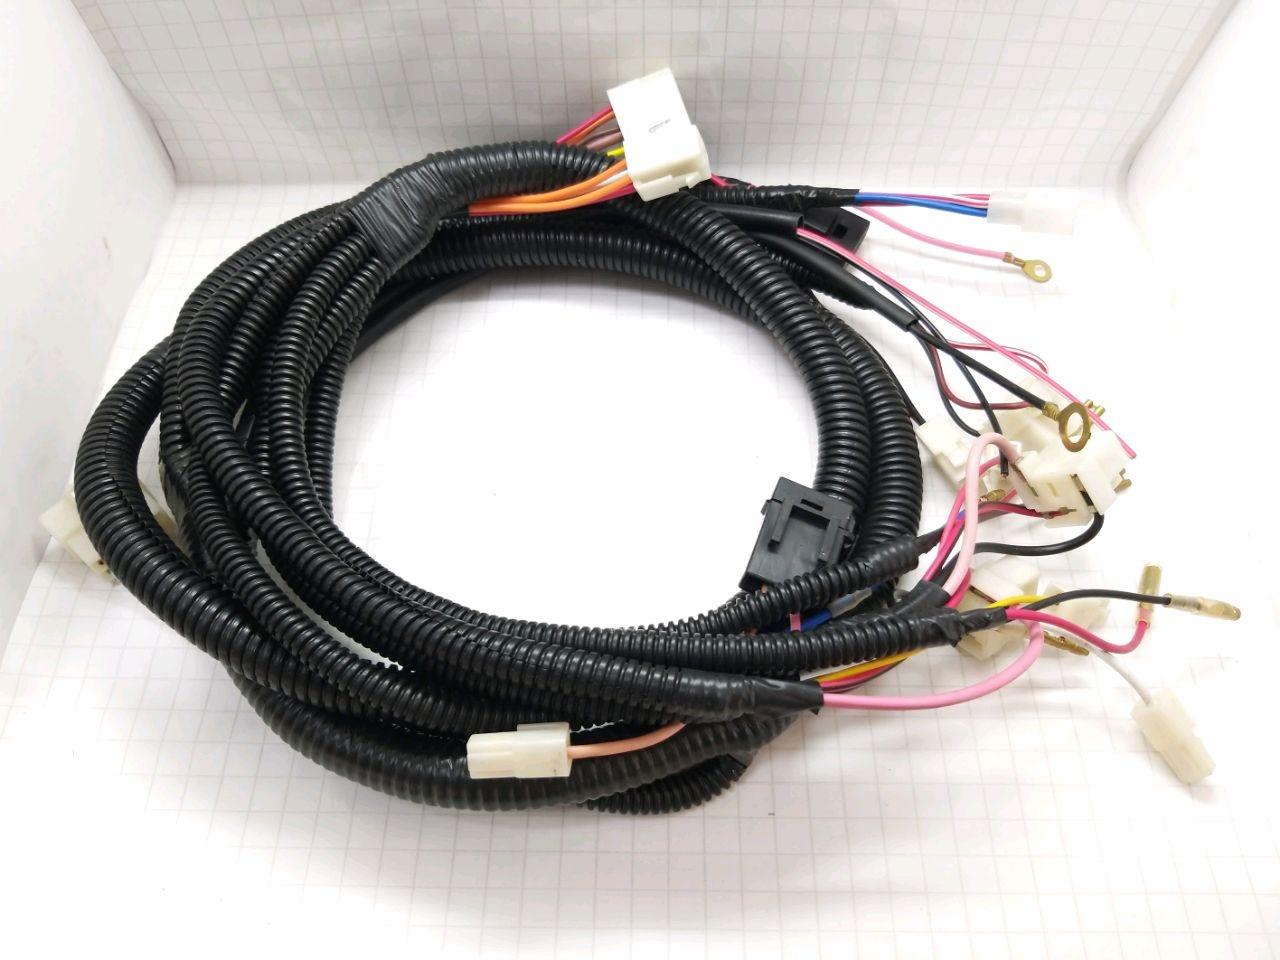 Cabluri electrice set p/u minitractor